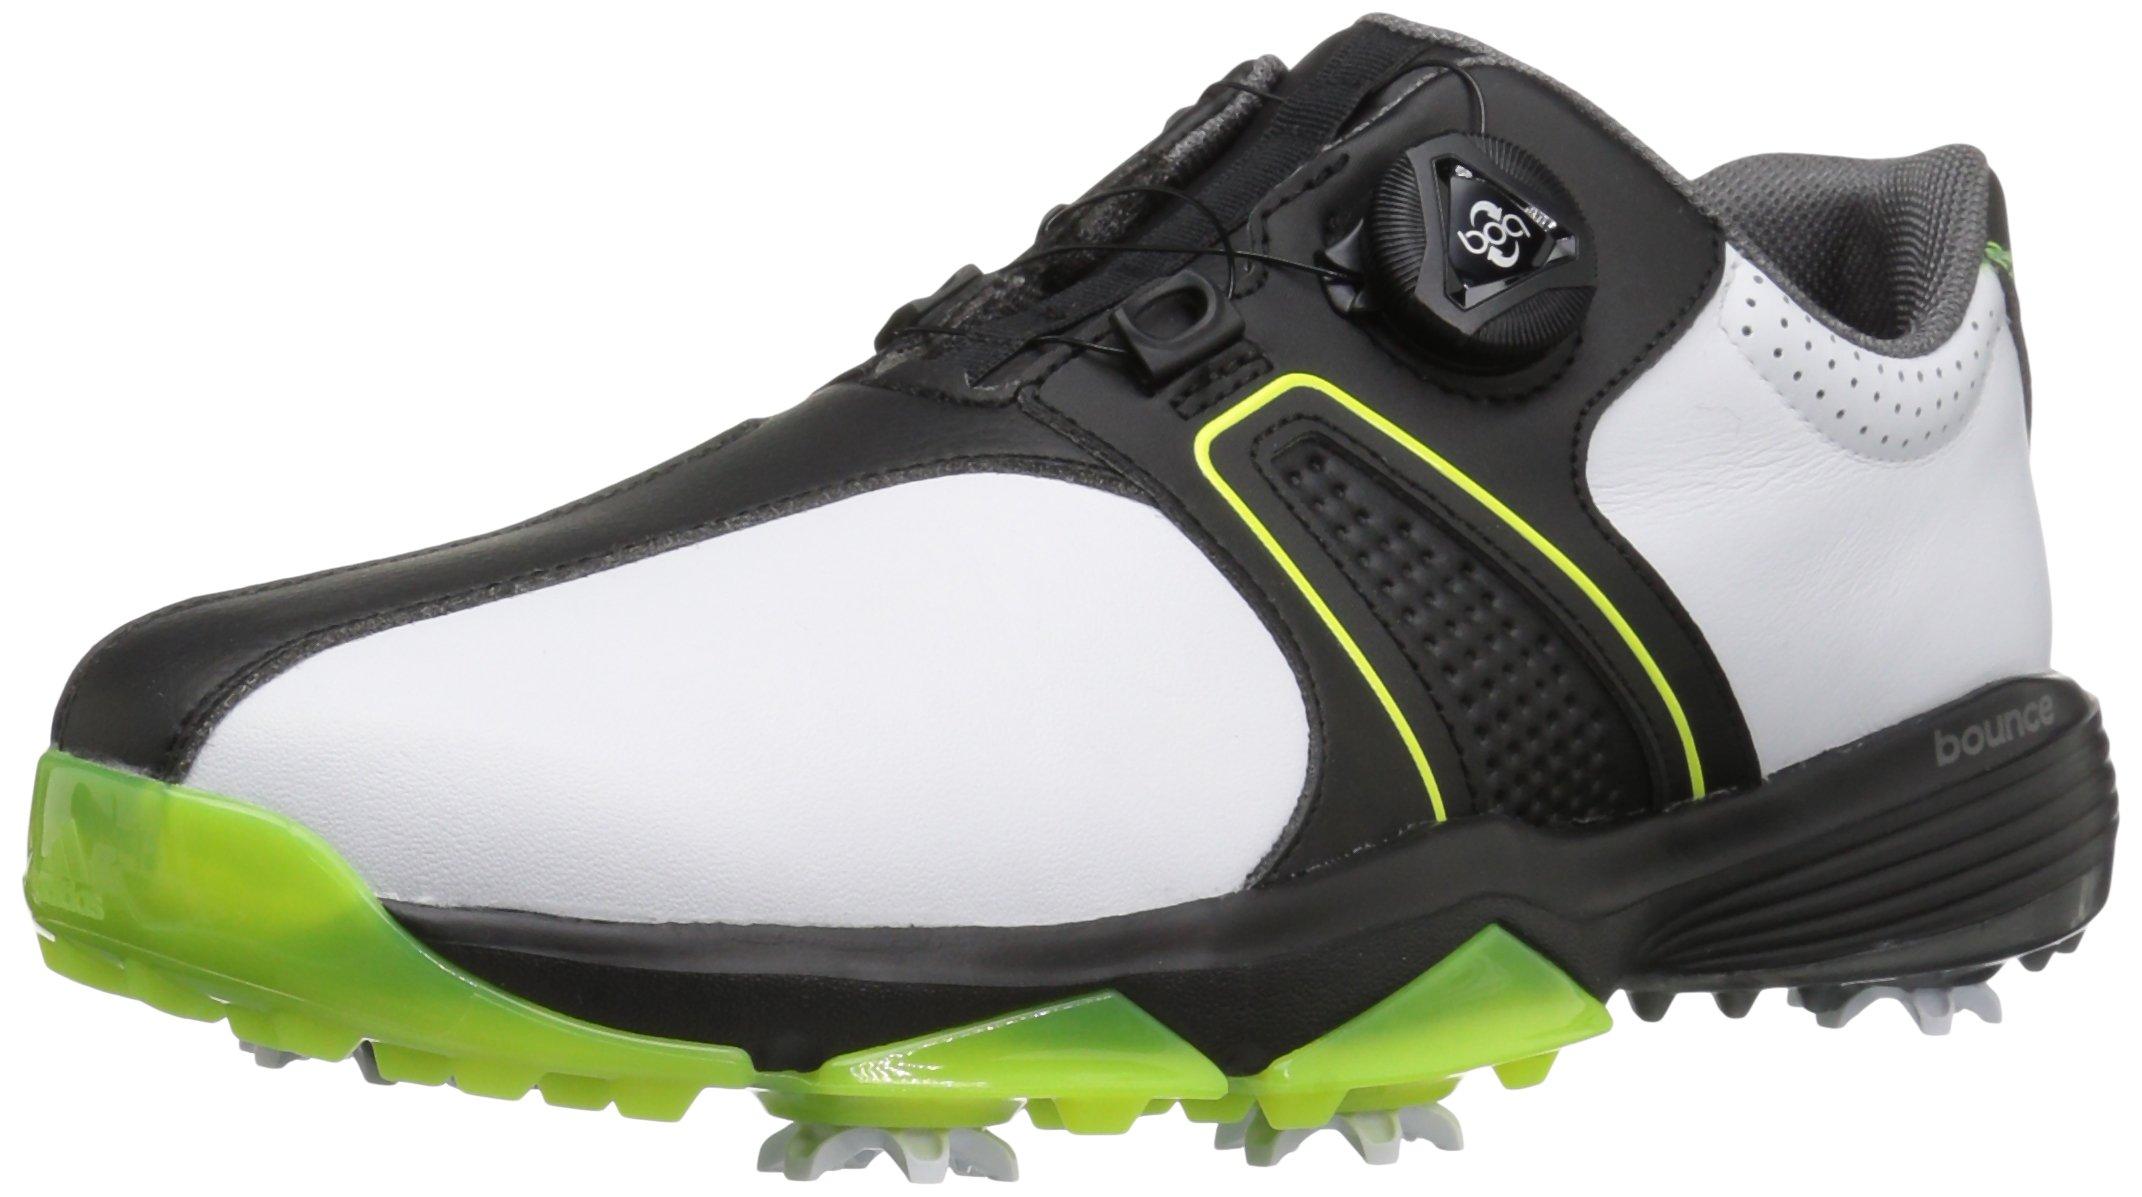 adidas Men s 360 Traxion Boa Golf Shoe Ftwr White Core Black Solar ... b7c7ee2869a